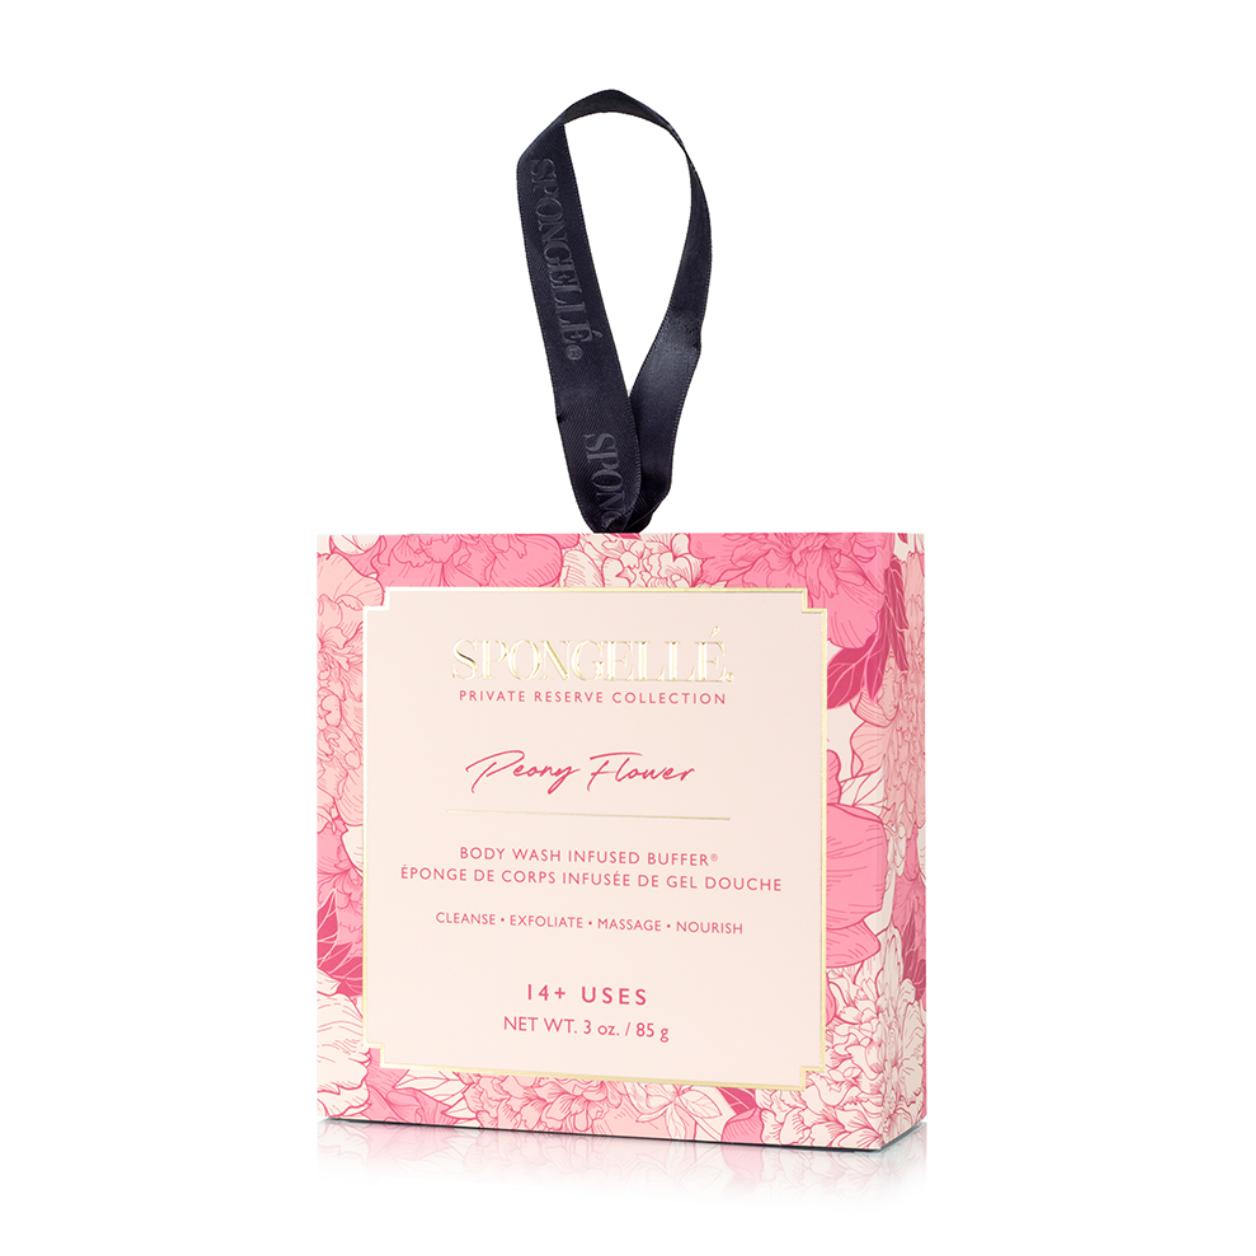 Boxed flower peony flower